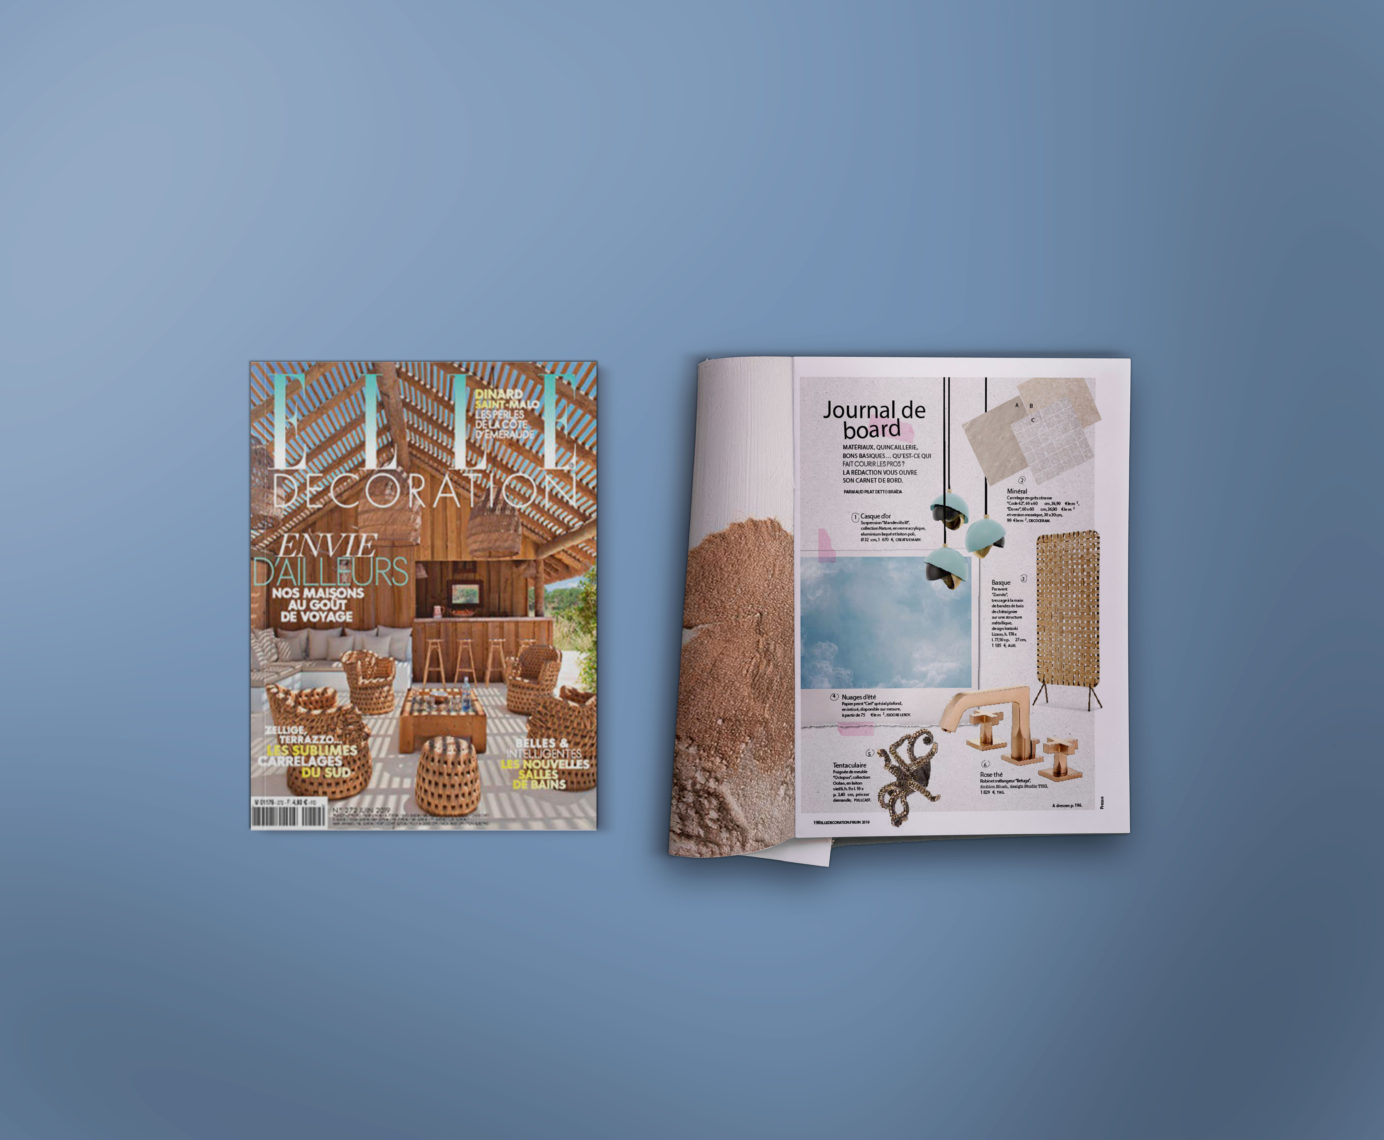 Top 10 Interior Design Magazines-elledecorationfr